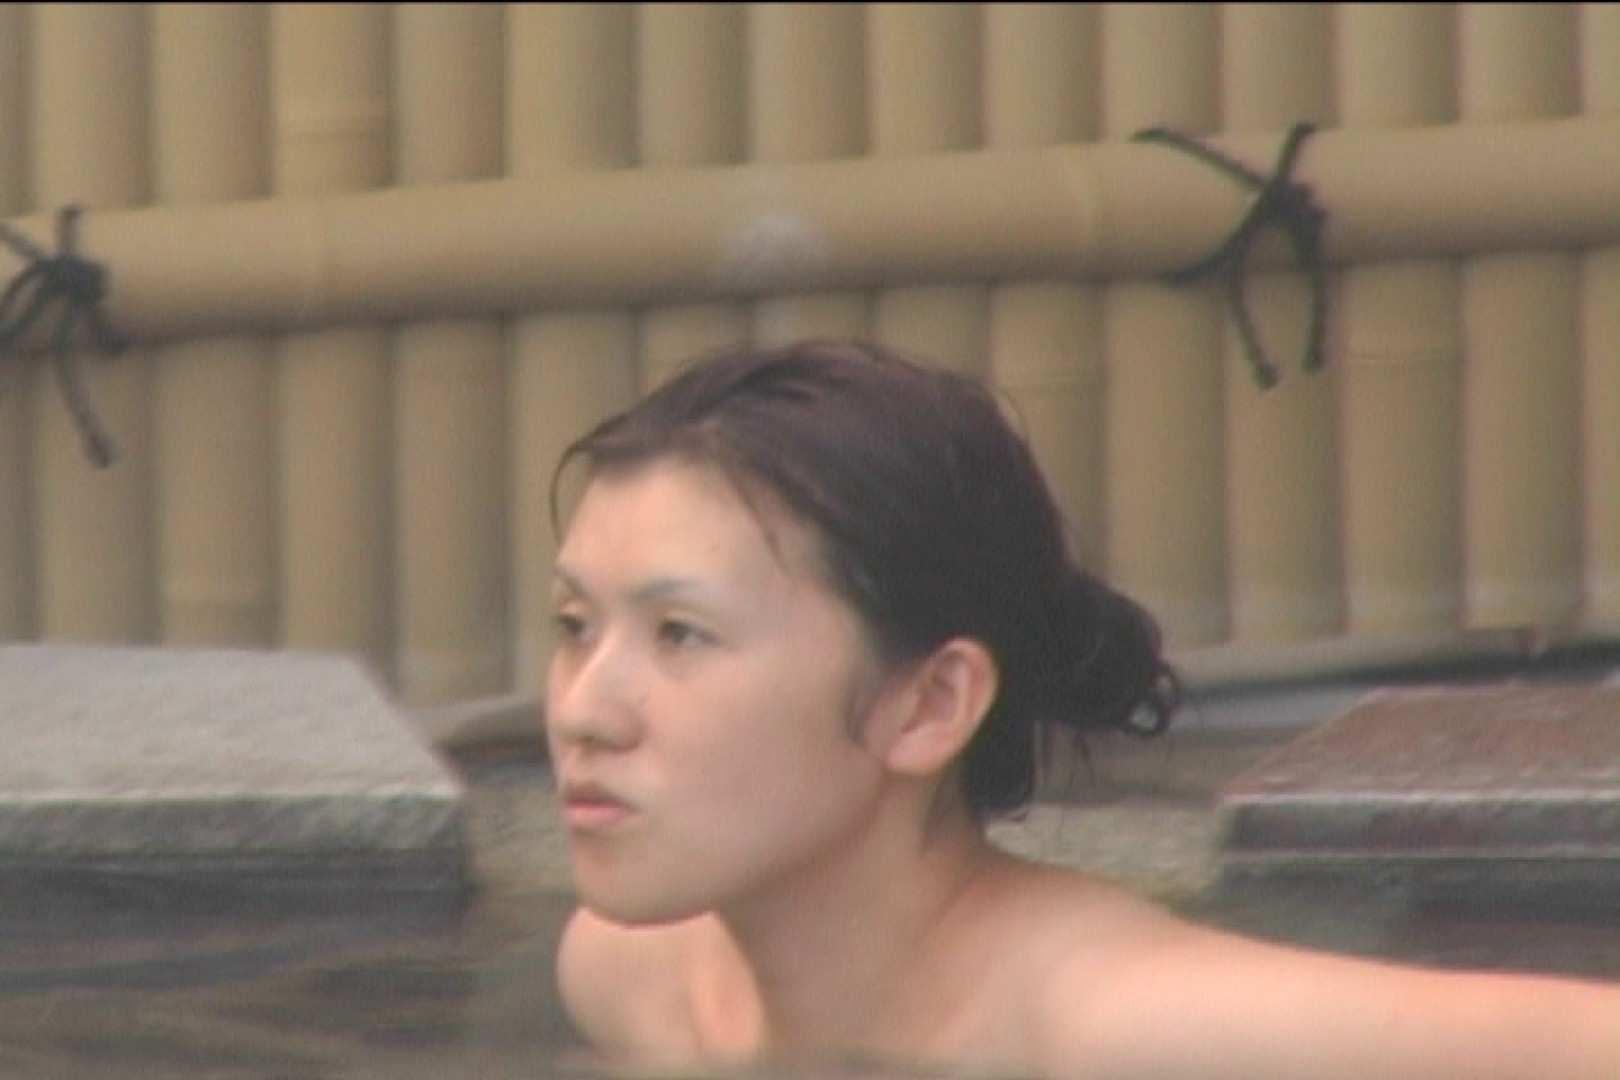 Aquaな露天風呂Vol.532 OLセックス 盗撮ワレメ無修正動画無料 105画像 41